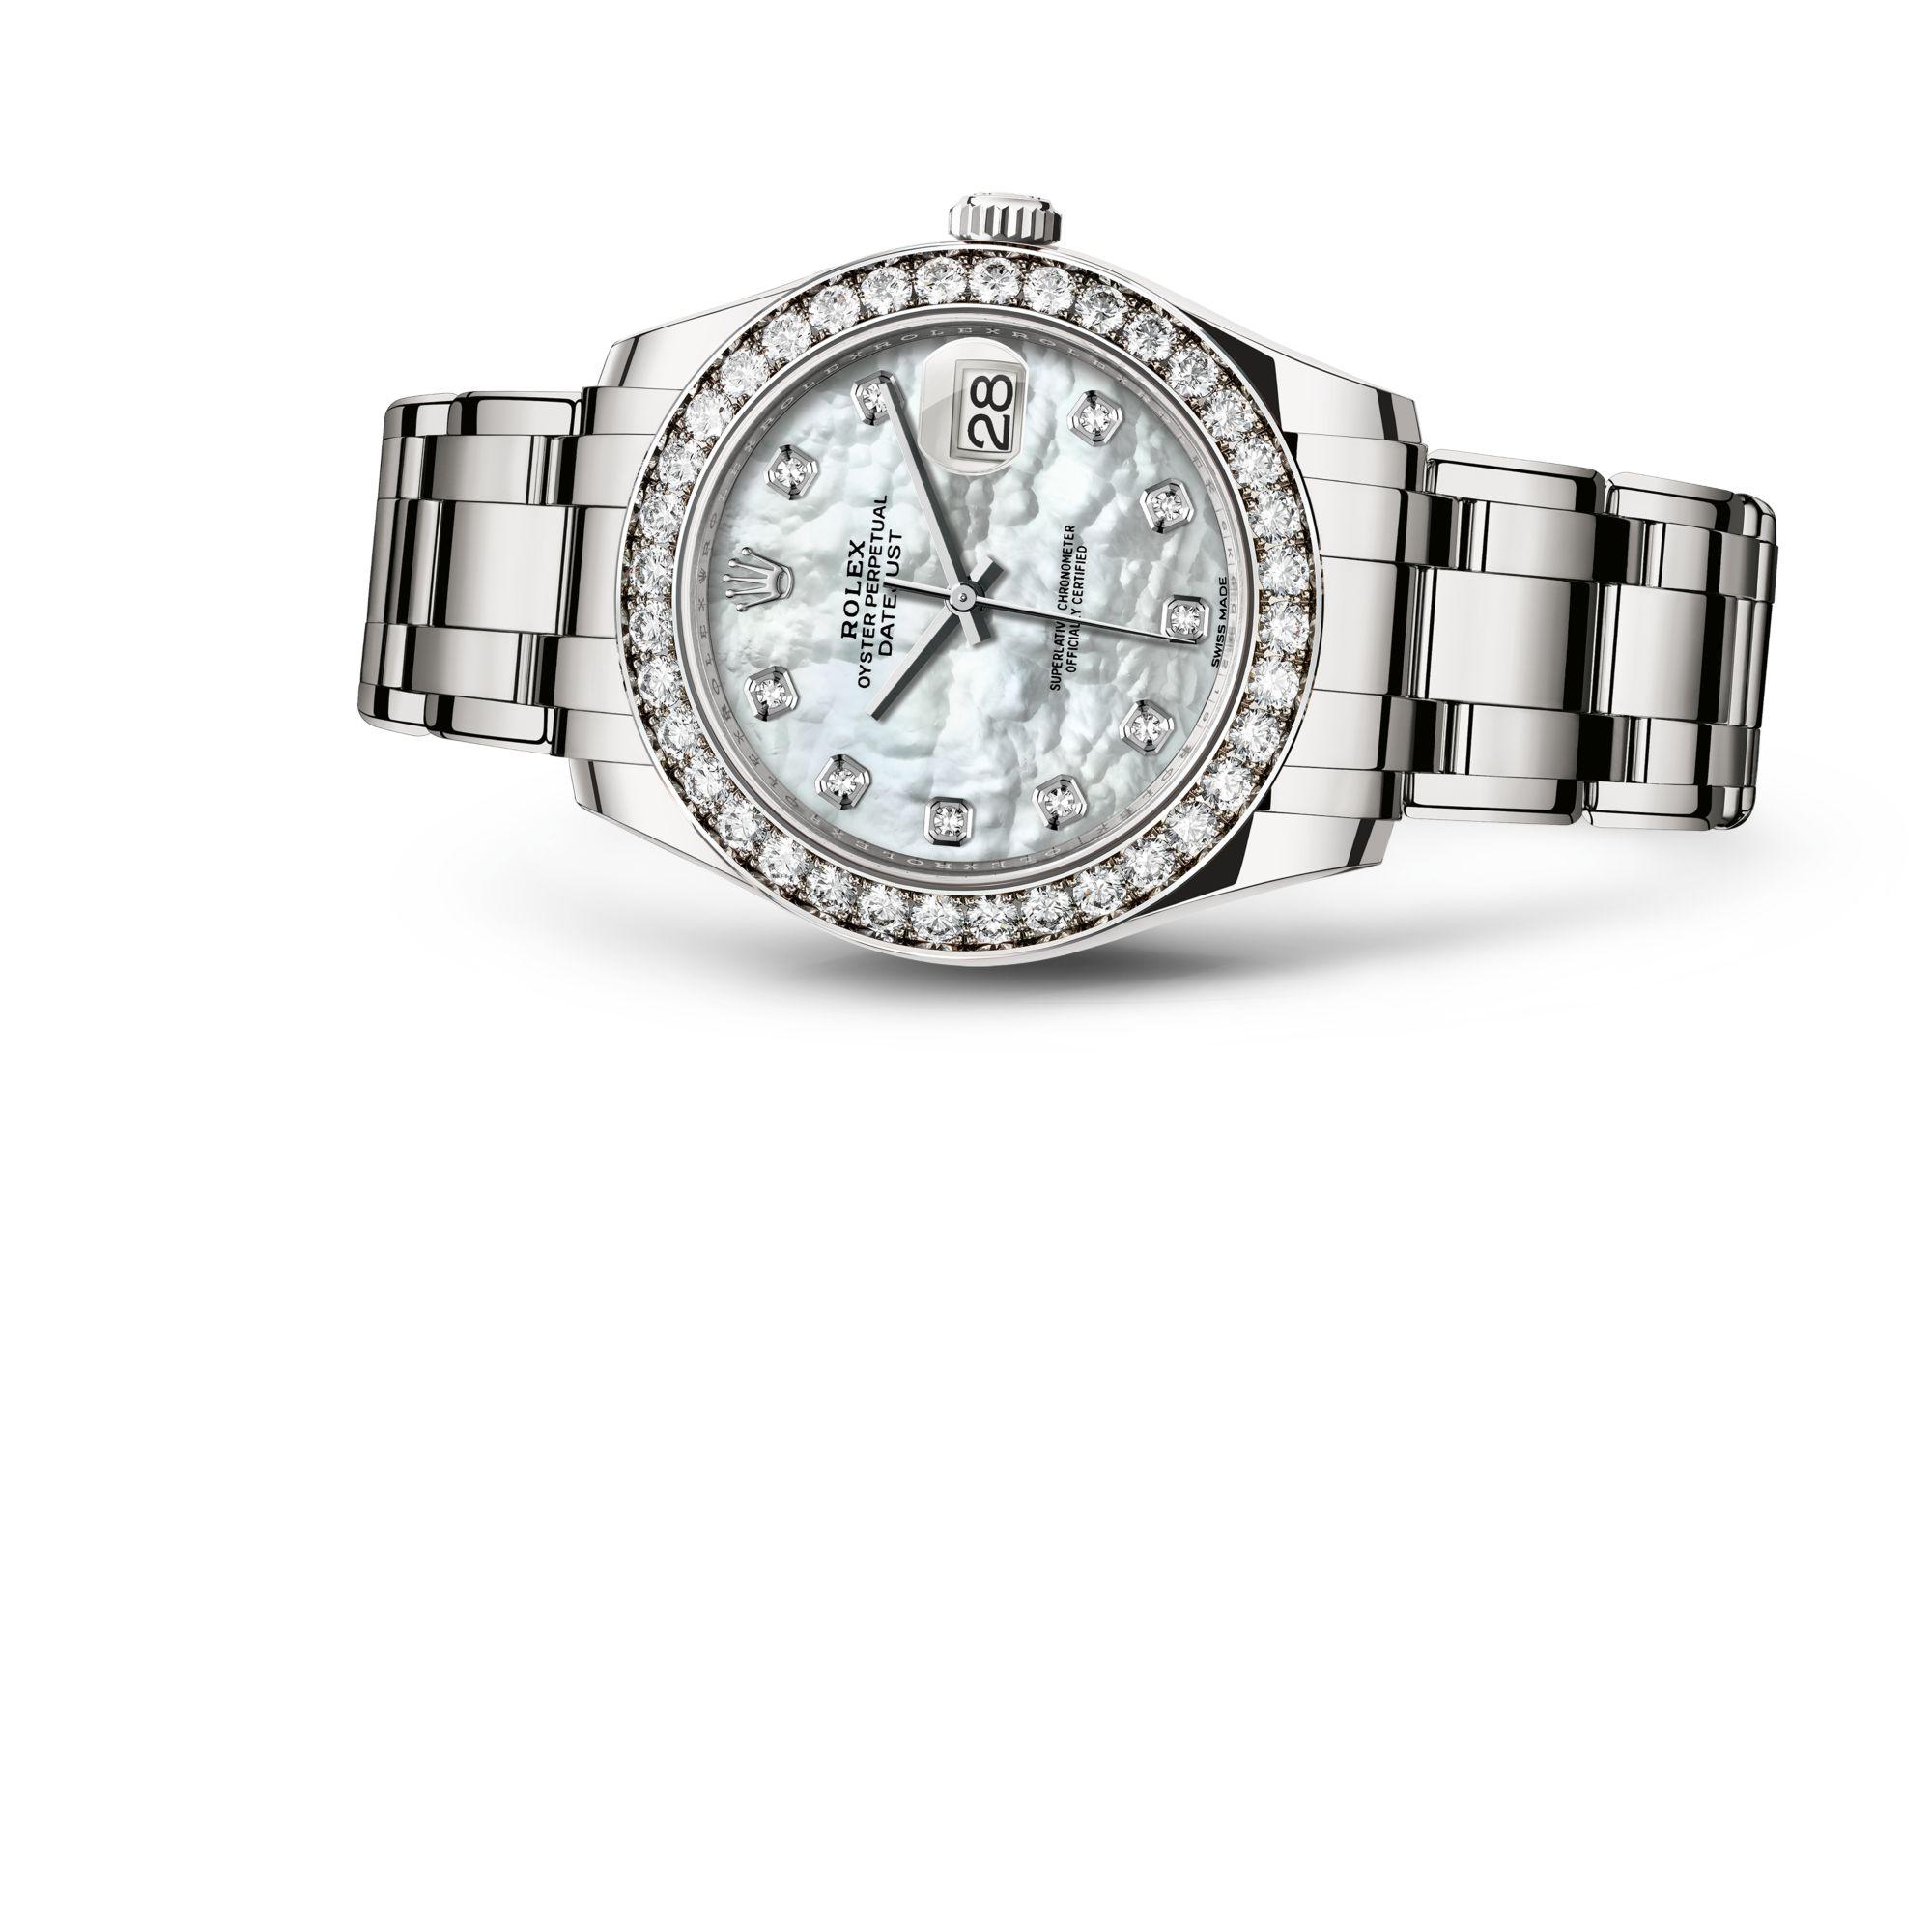 Rolex Pearlmaster 39 M86289-0001